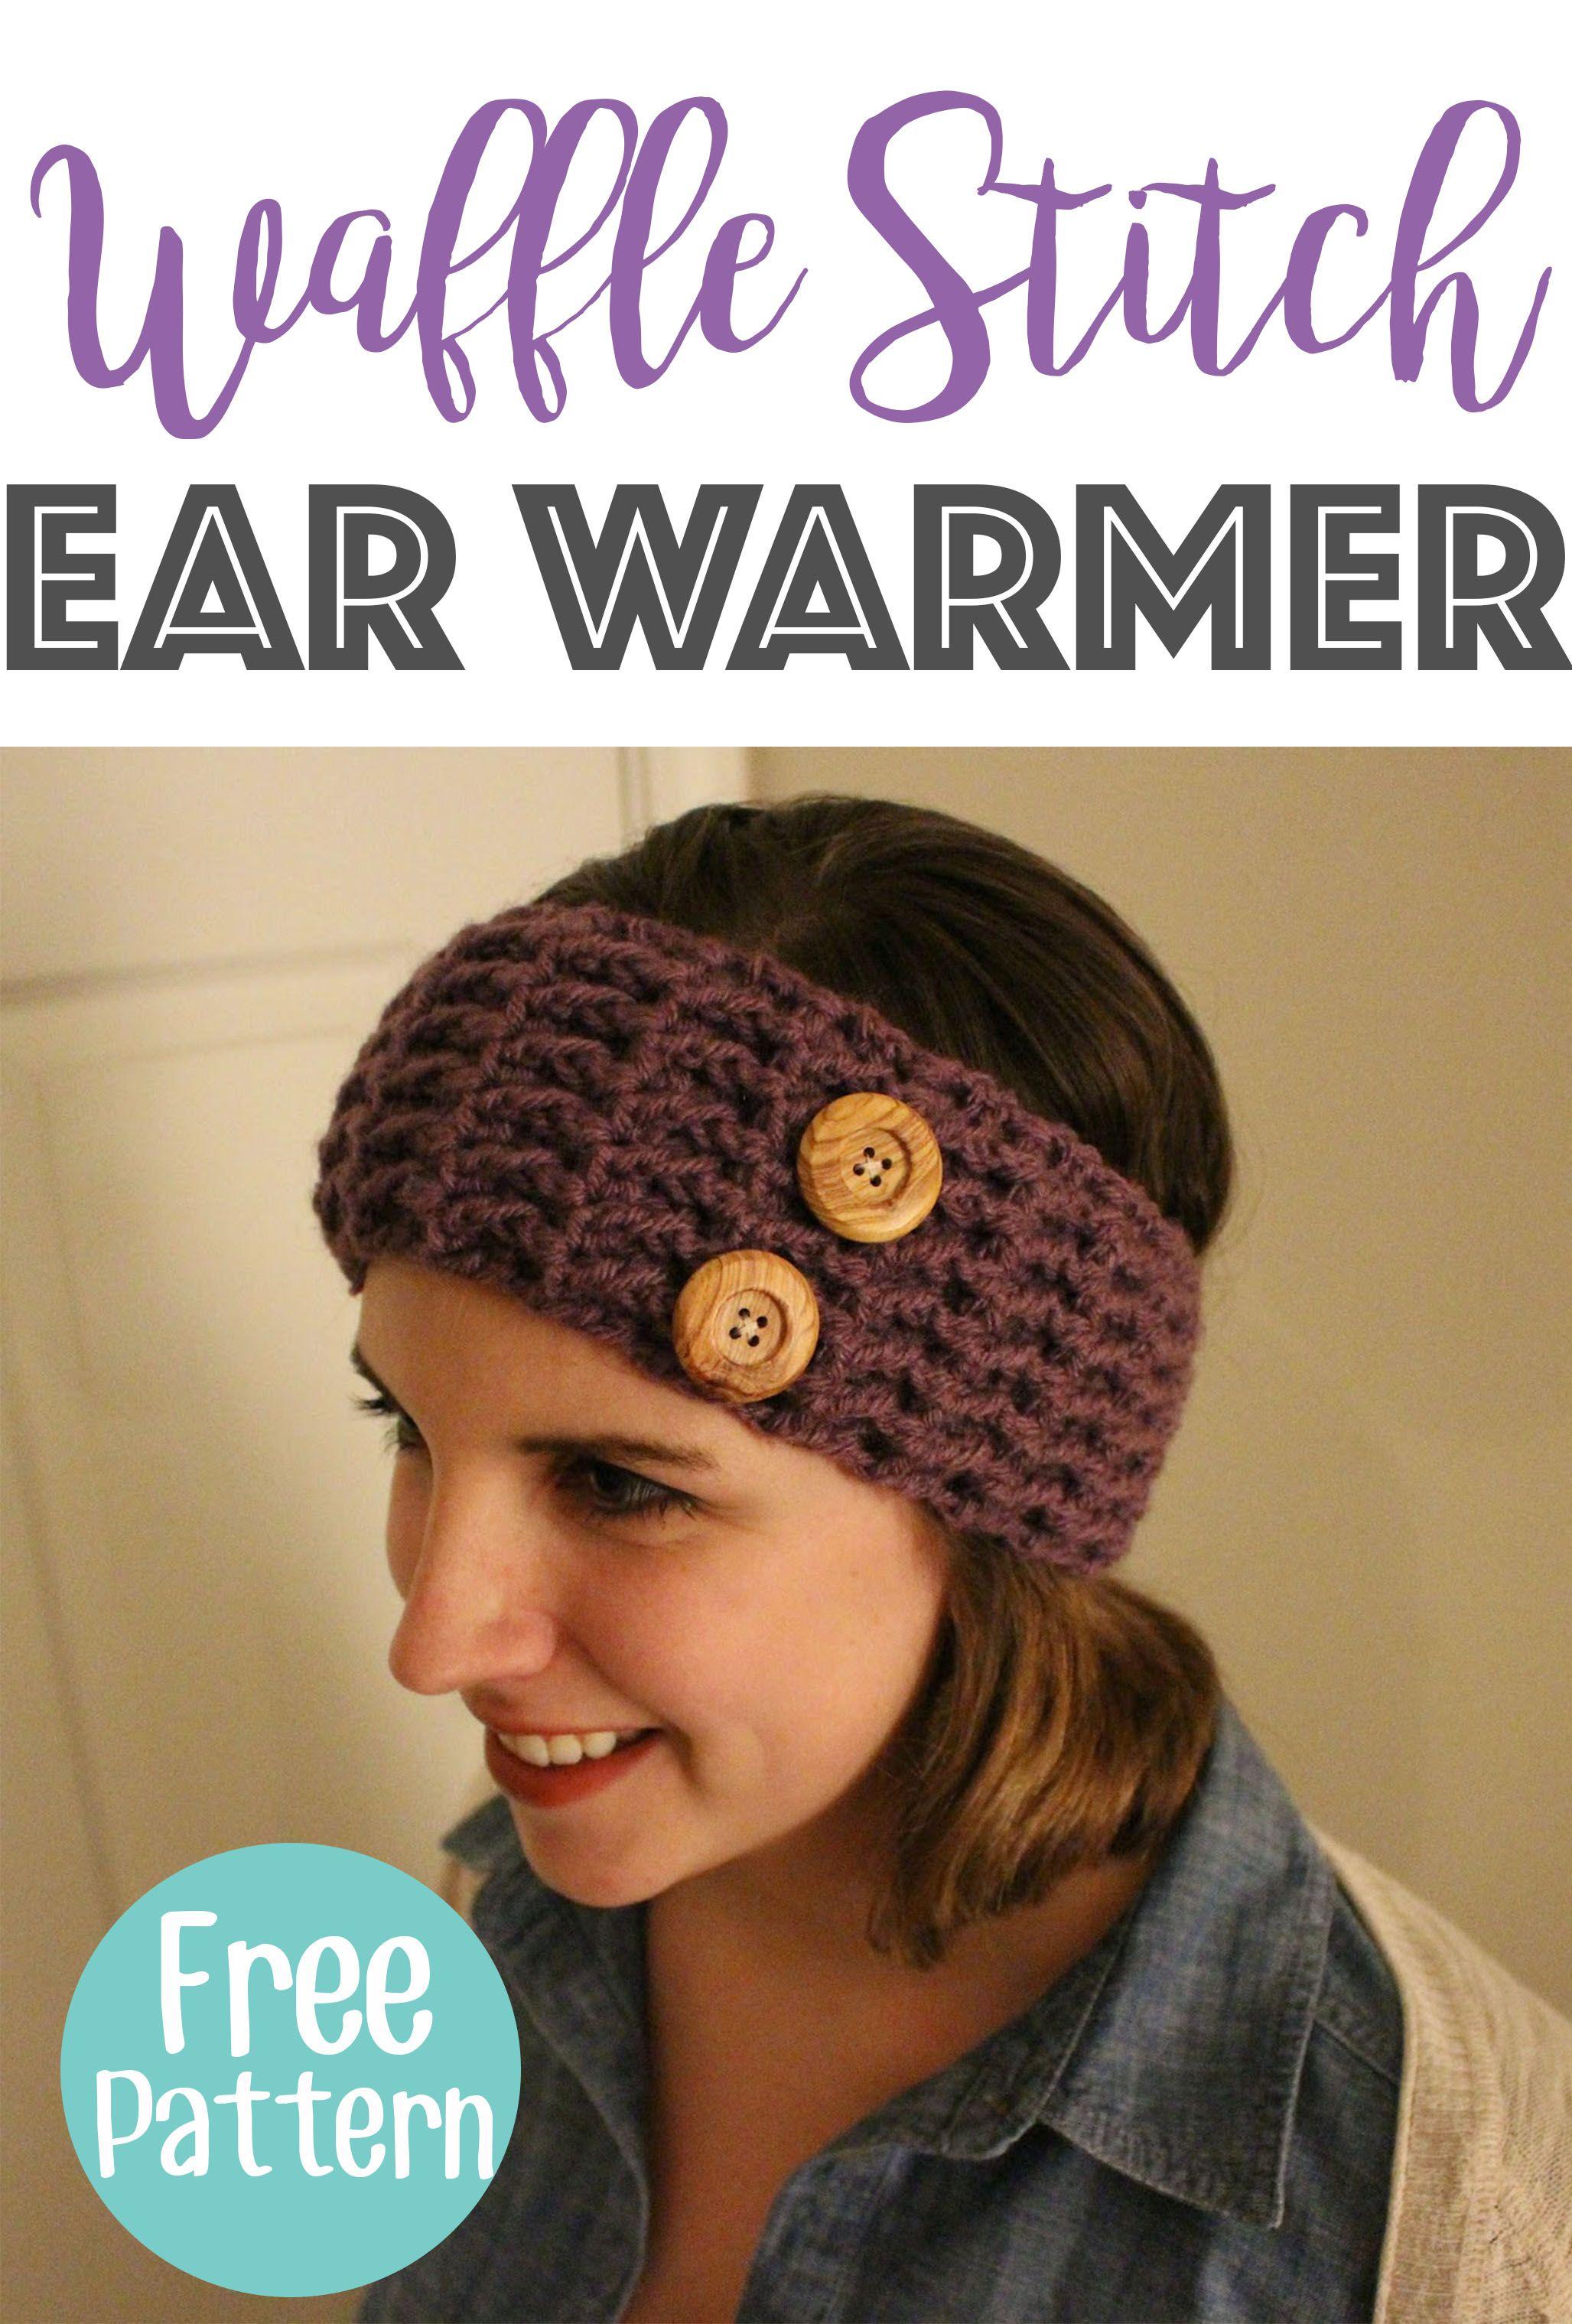 Waffle Stitch Ear Warmer Pattern and Tutorial | Pinterest | Ear ...